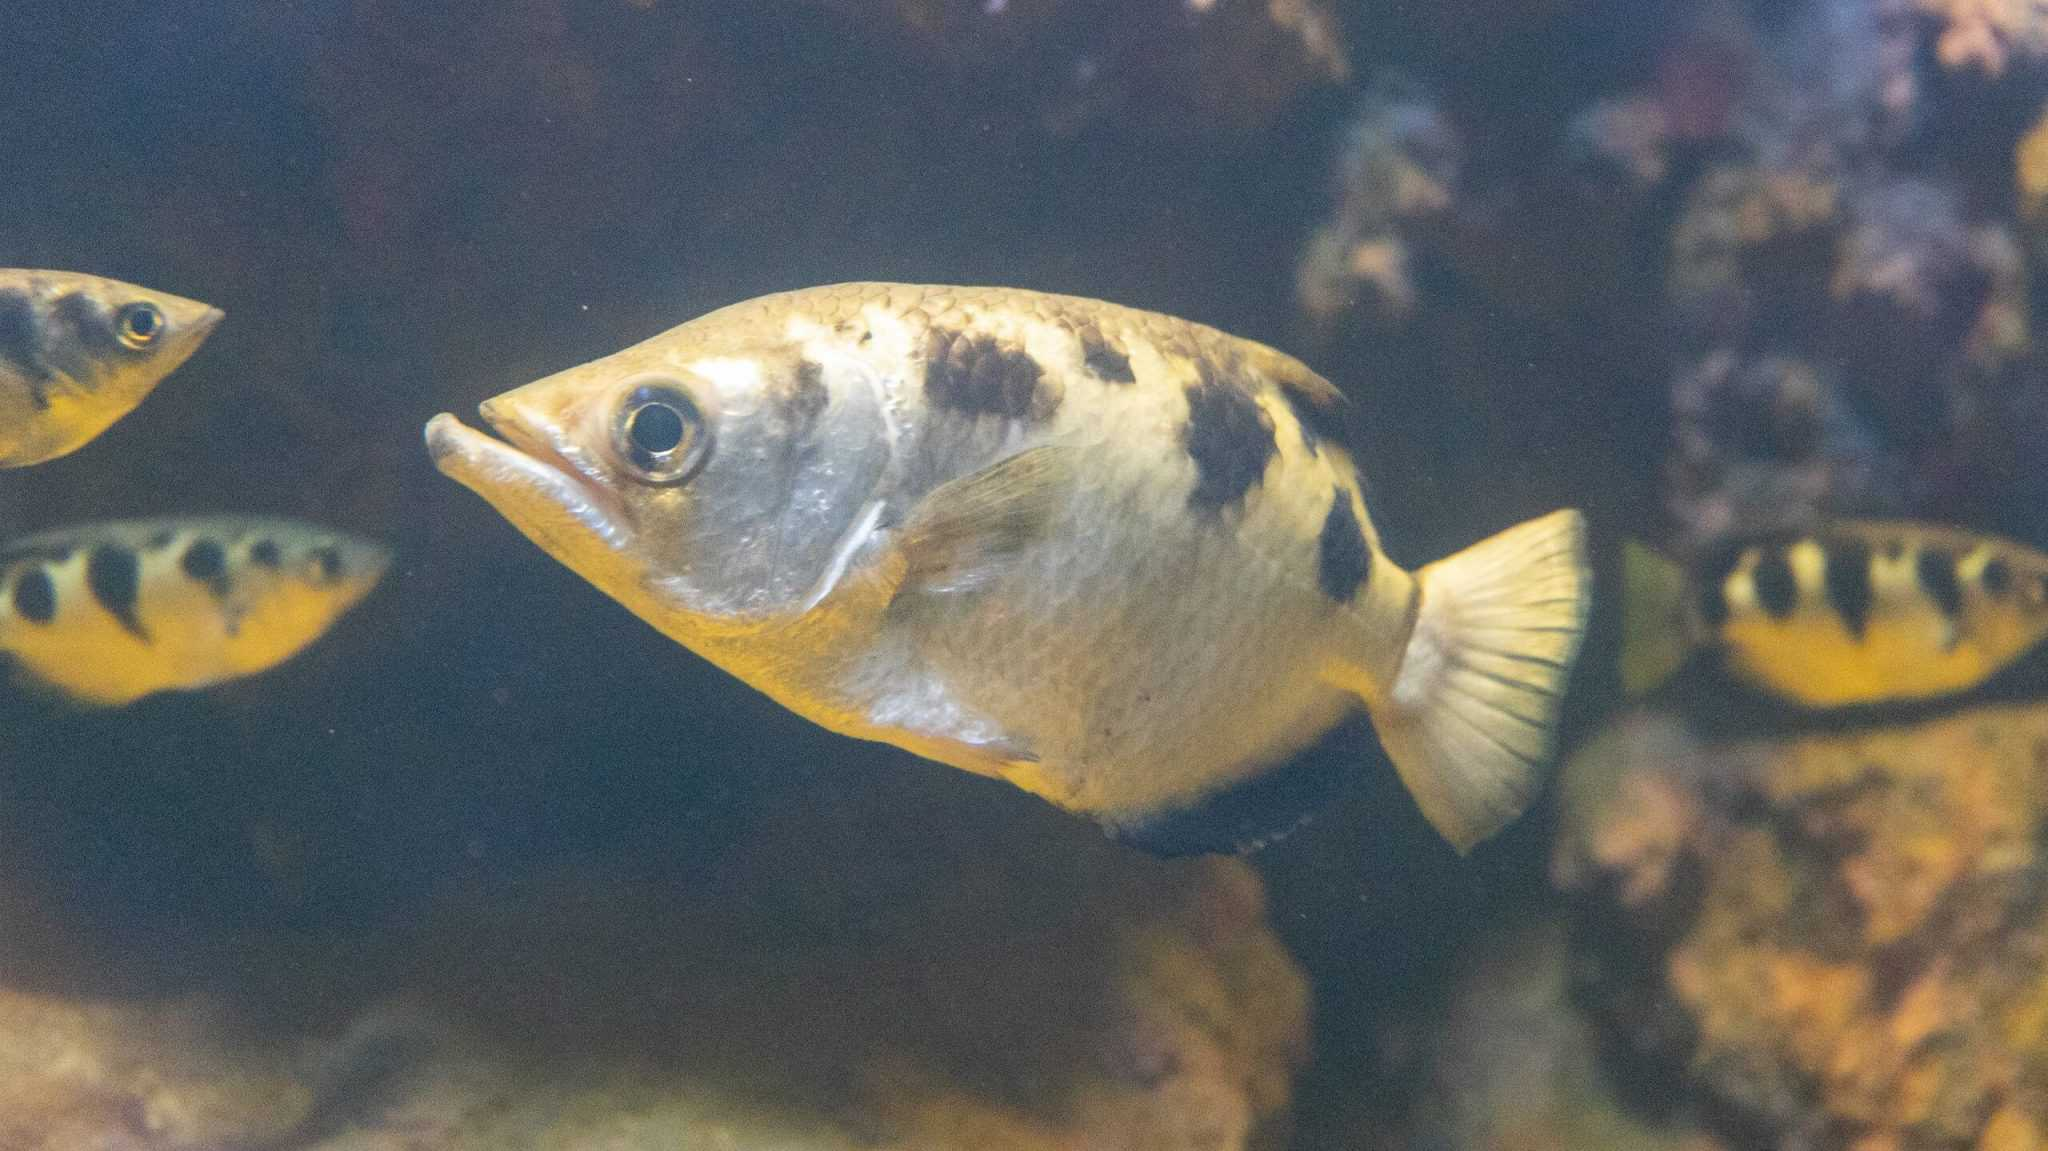 Poisson archer (toxotes jaculatrix) - Aquarium de Paris